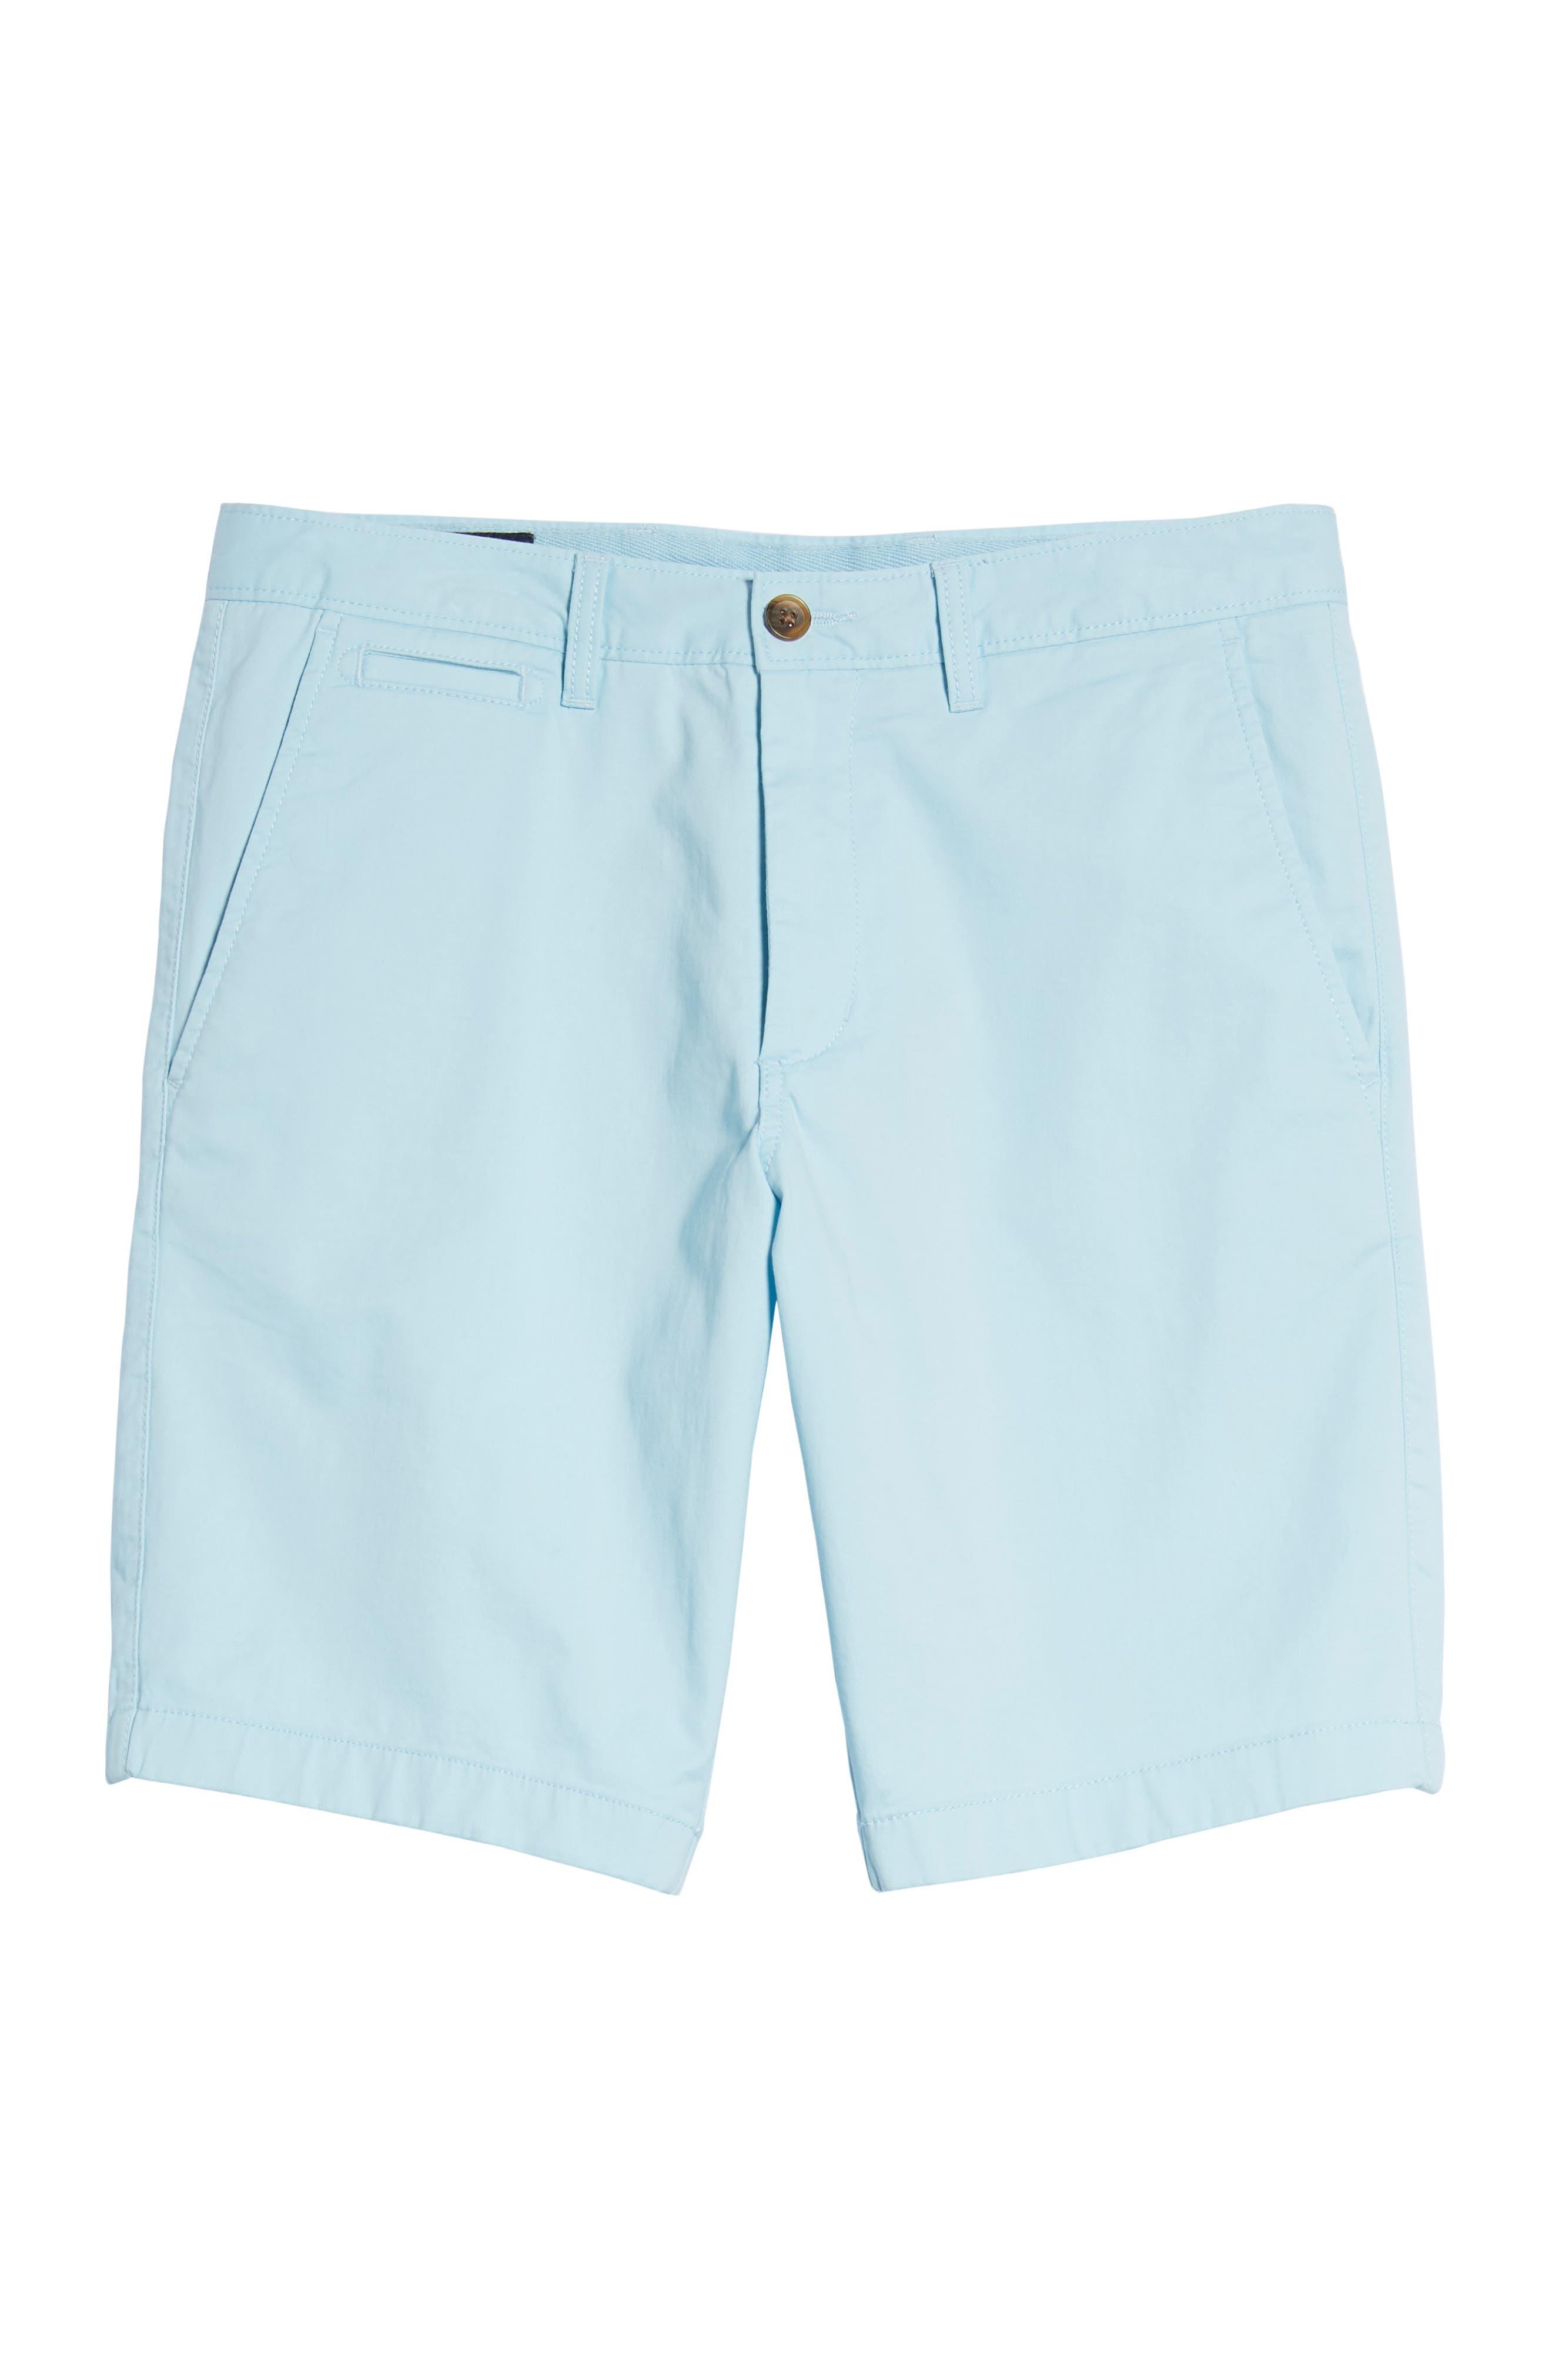 Ballard Slim Fit Stretch Chino 11-Inch Shorts,                             Alternate thumbnail 85, color,